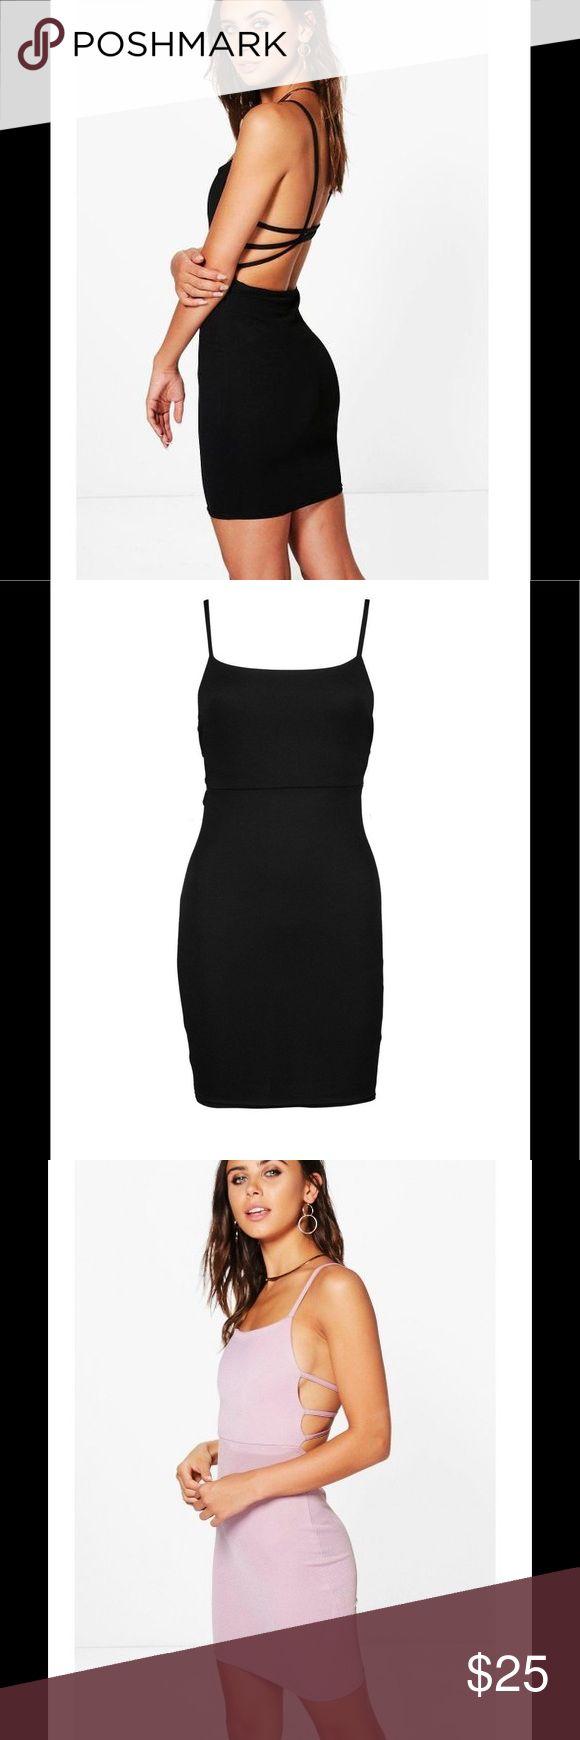 🌸COMING SOON 🌸NWT Black Petite Bodycon Dress Brand sold at Asos.com Asos Dresses Mini